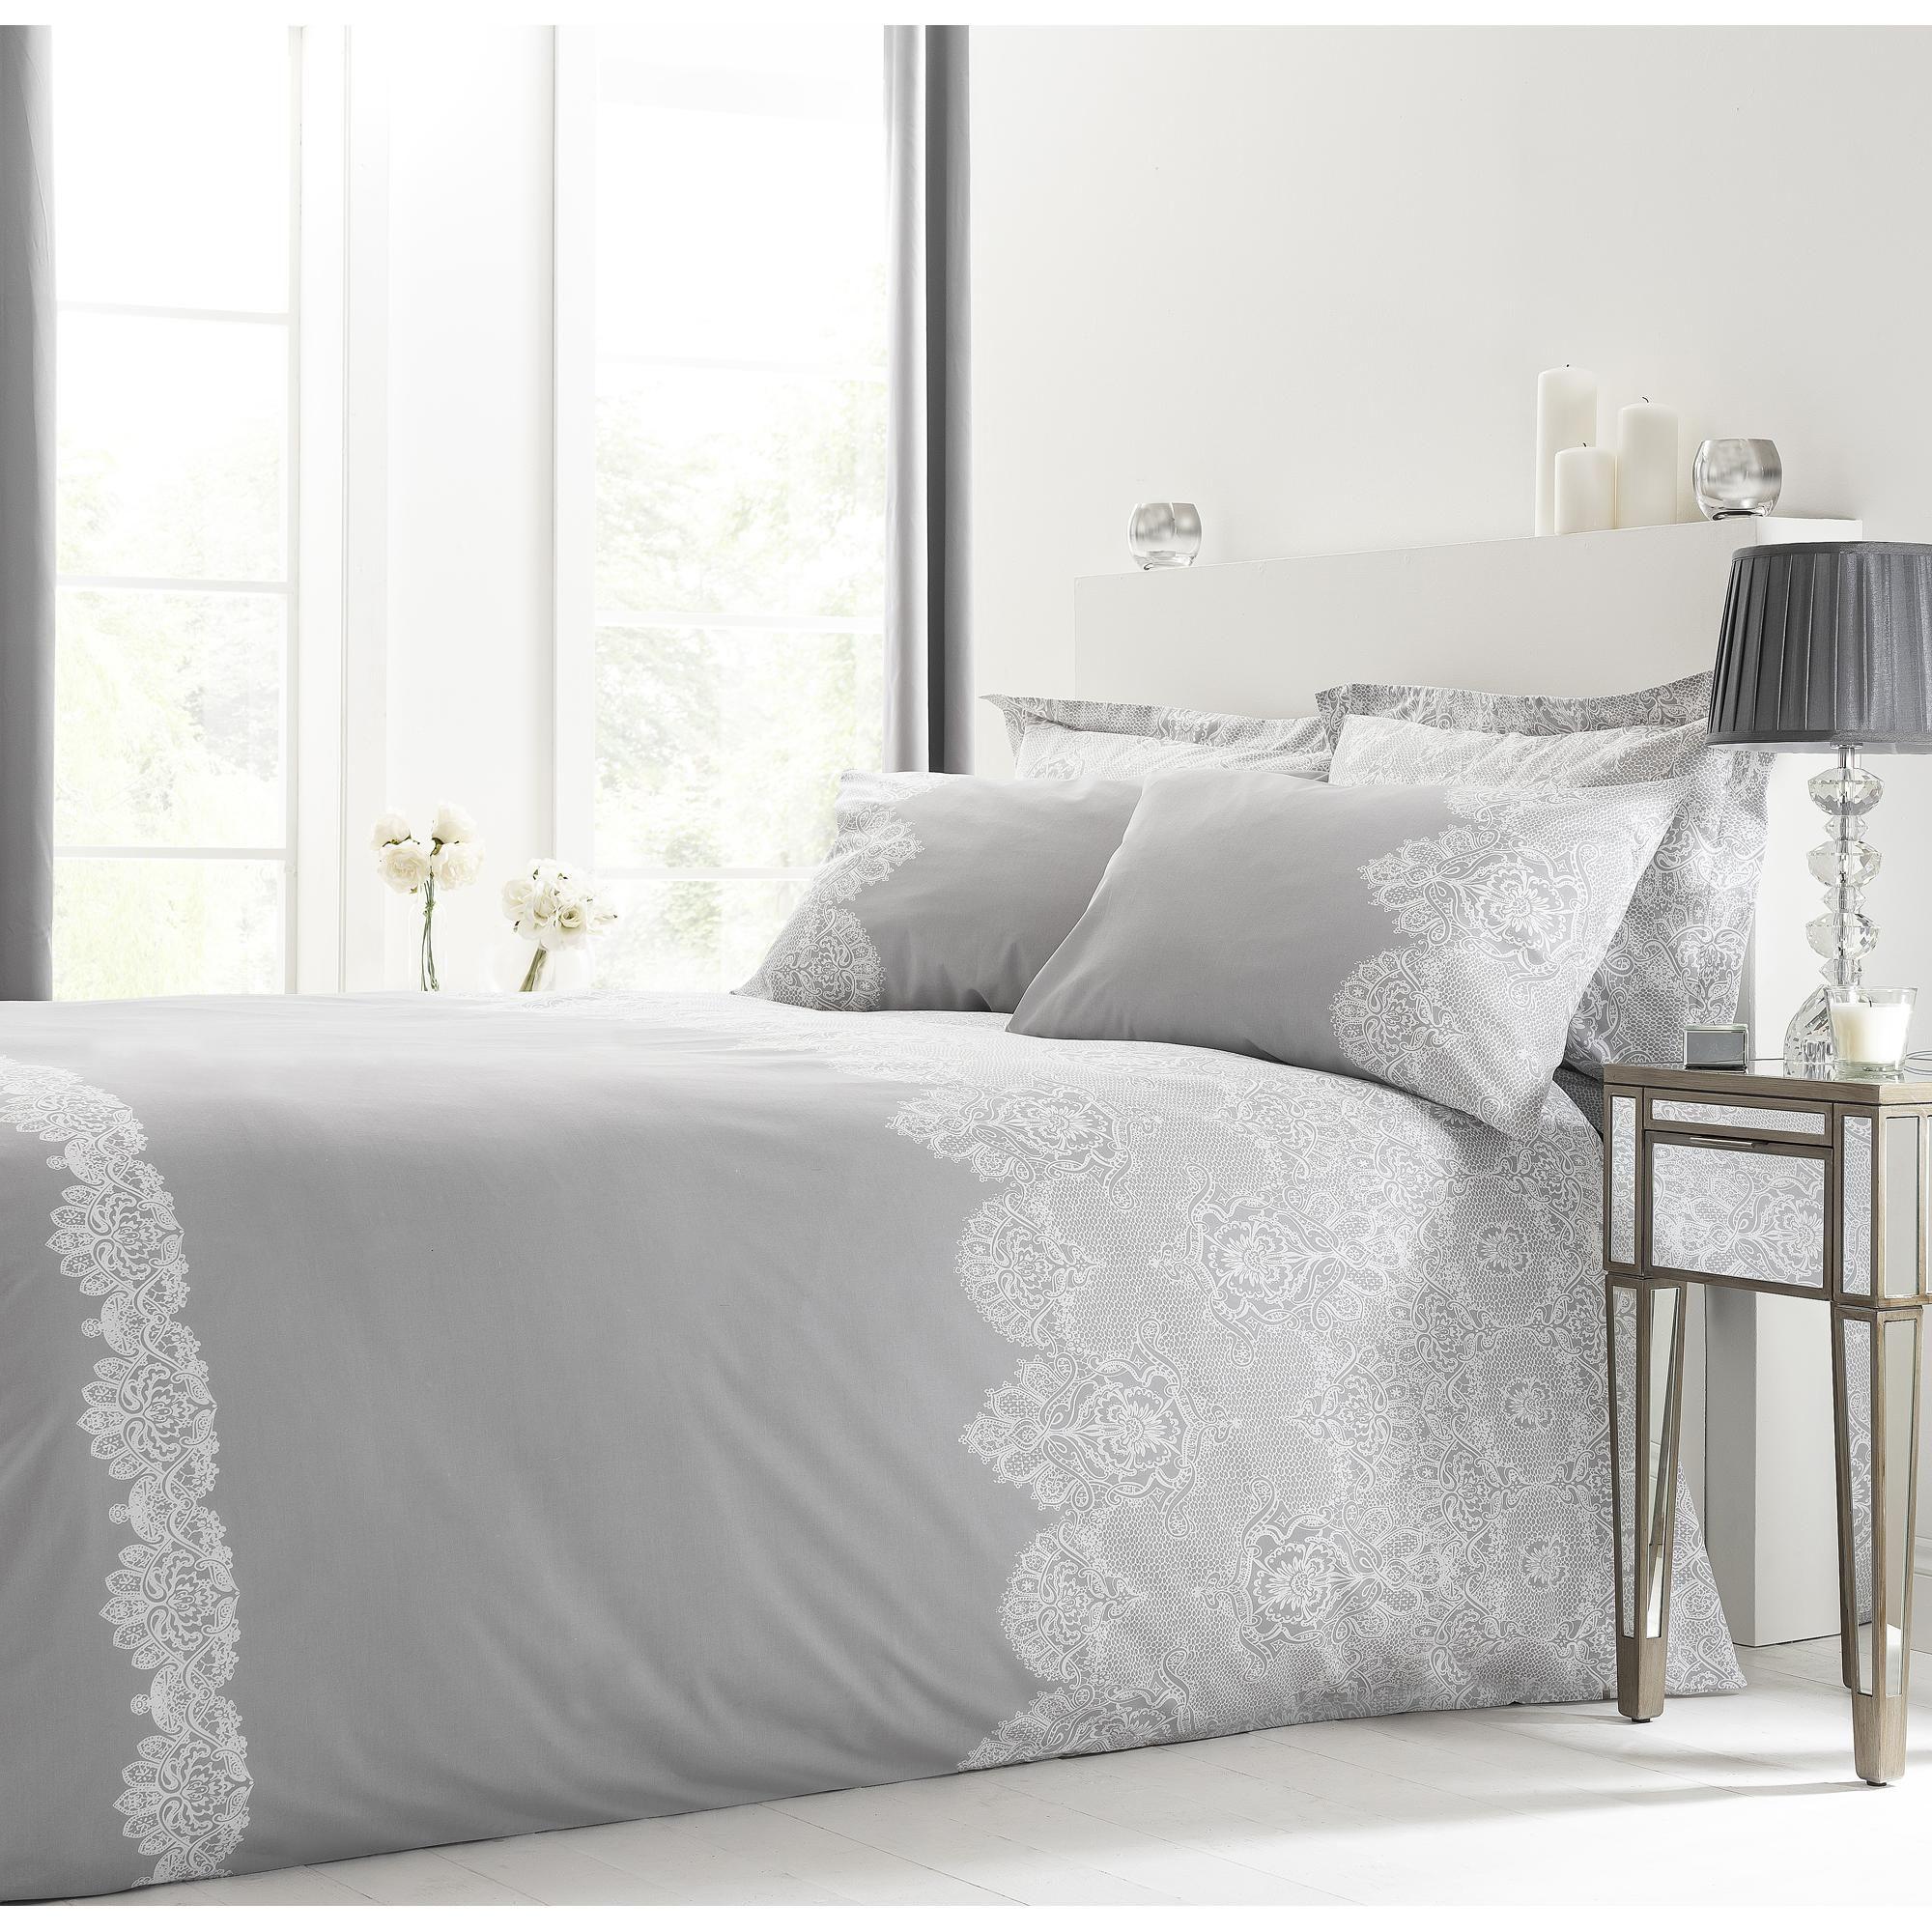 Eleanor Grey Duvet Cover And Pillowcase Set Bedding Curtain